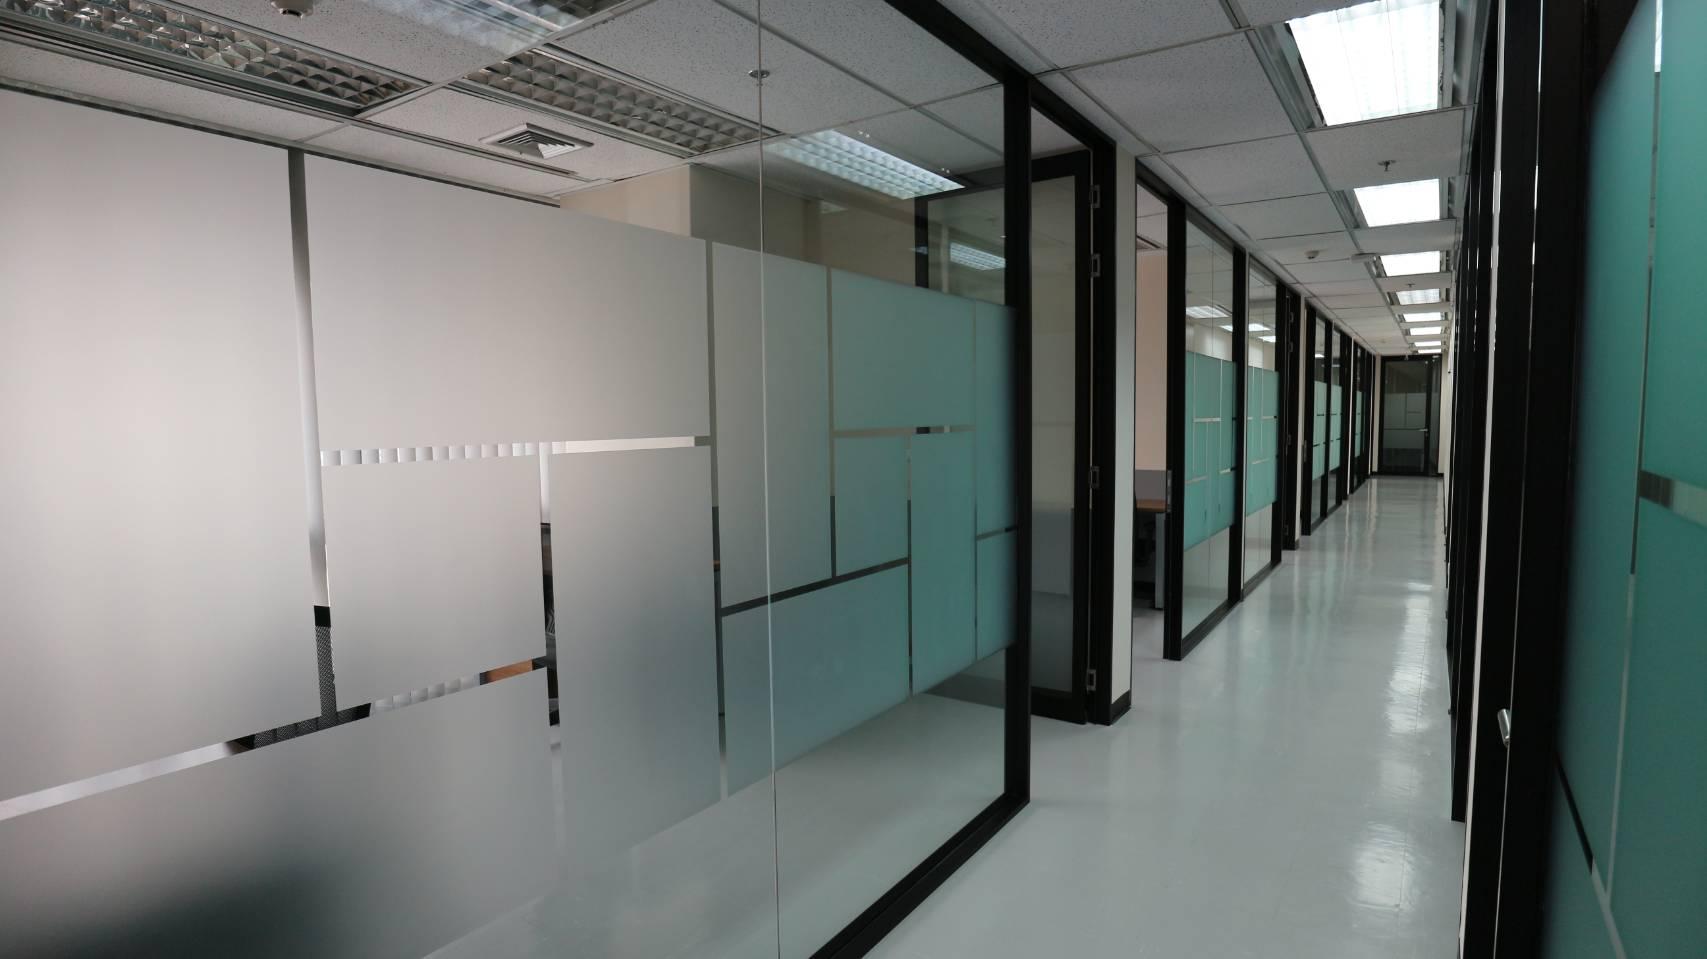 Shinei Serviced Office Space & Coworking, Bangkok